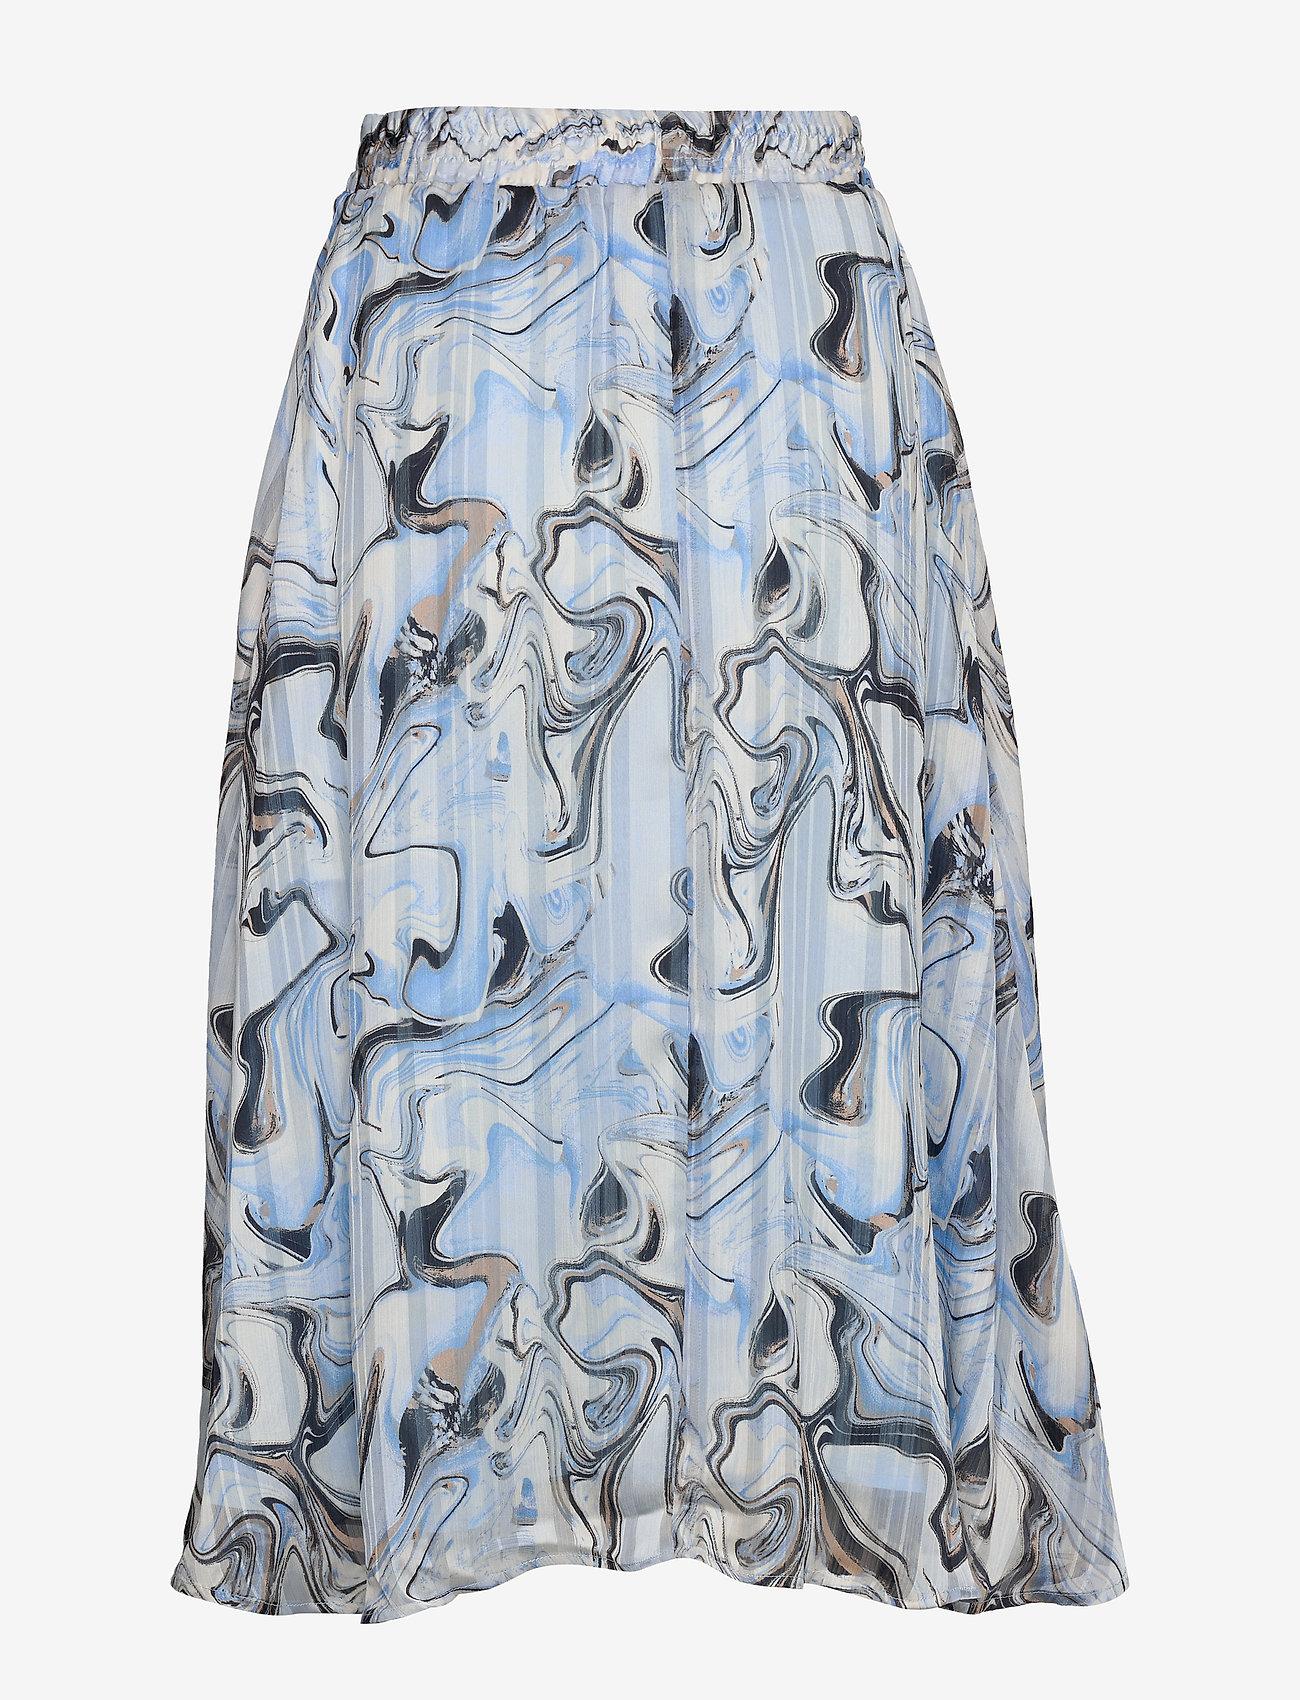 Inwear Reemaiw Skirt - Skirts